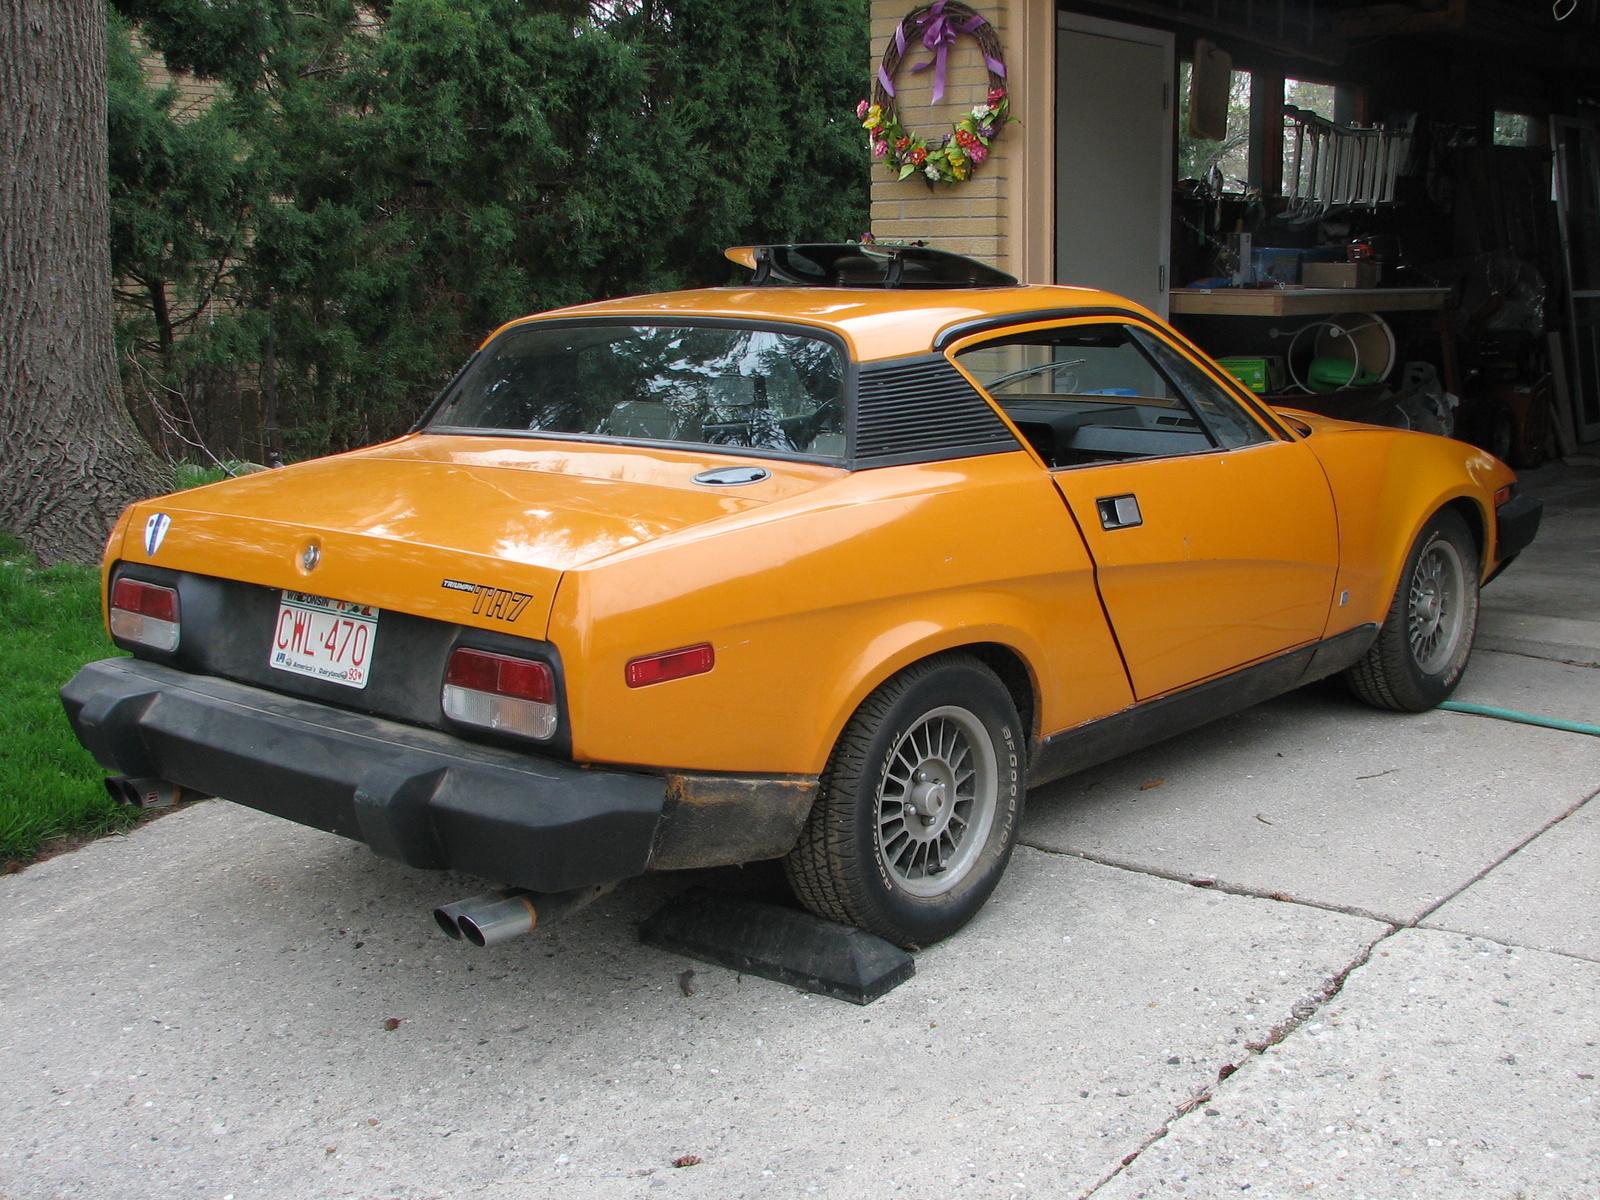 1976 Triumph Tr7 - Exterior Pictures